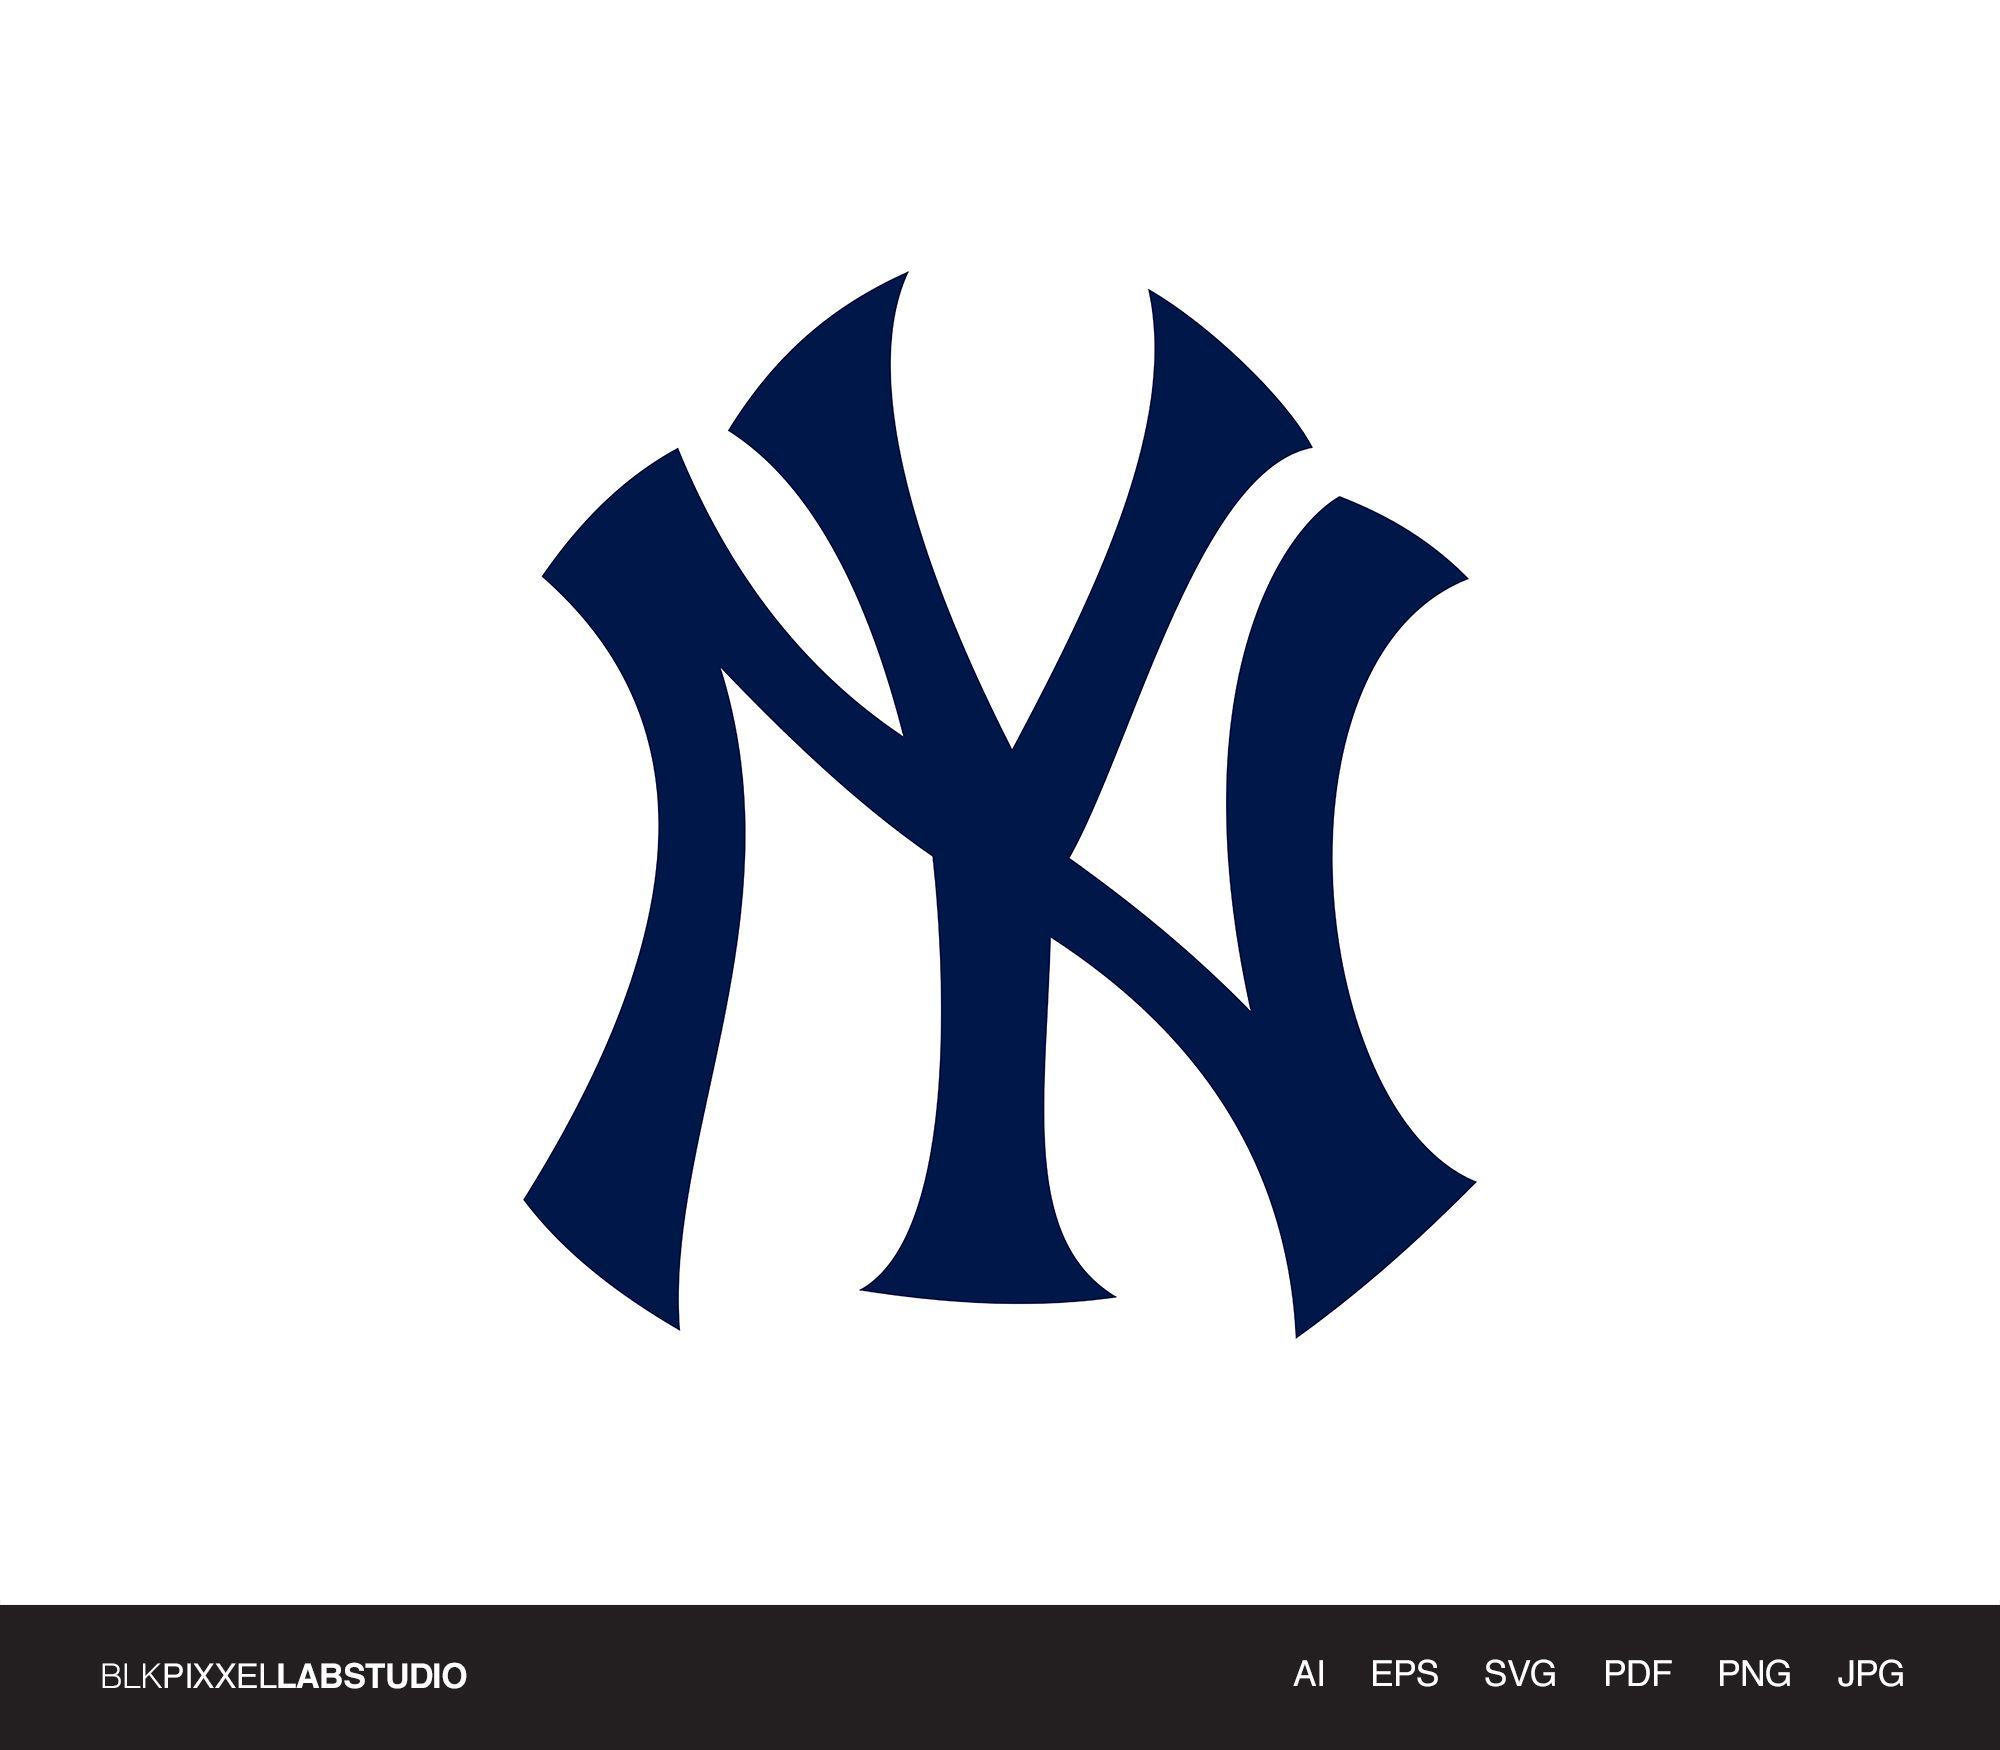 New York Yankees Svg Mlb Svg Husband Gift Gift For Him Etsy In 2021 Mlb Logos New York Yankees Logo Yankees Logo